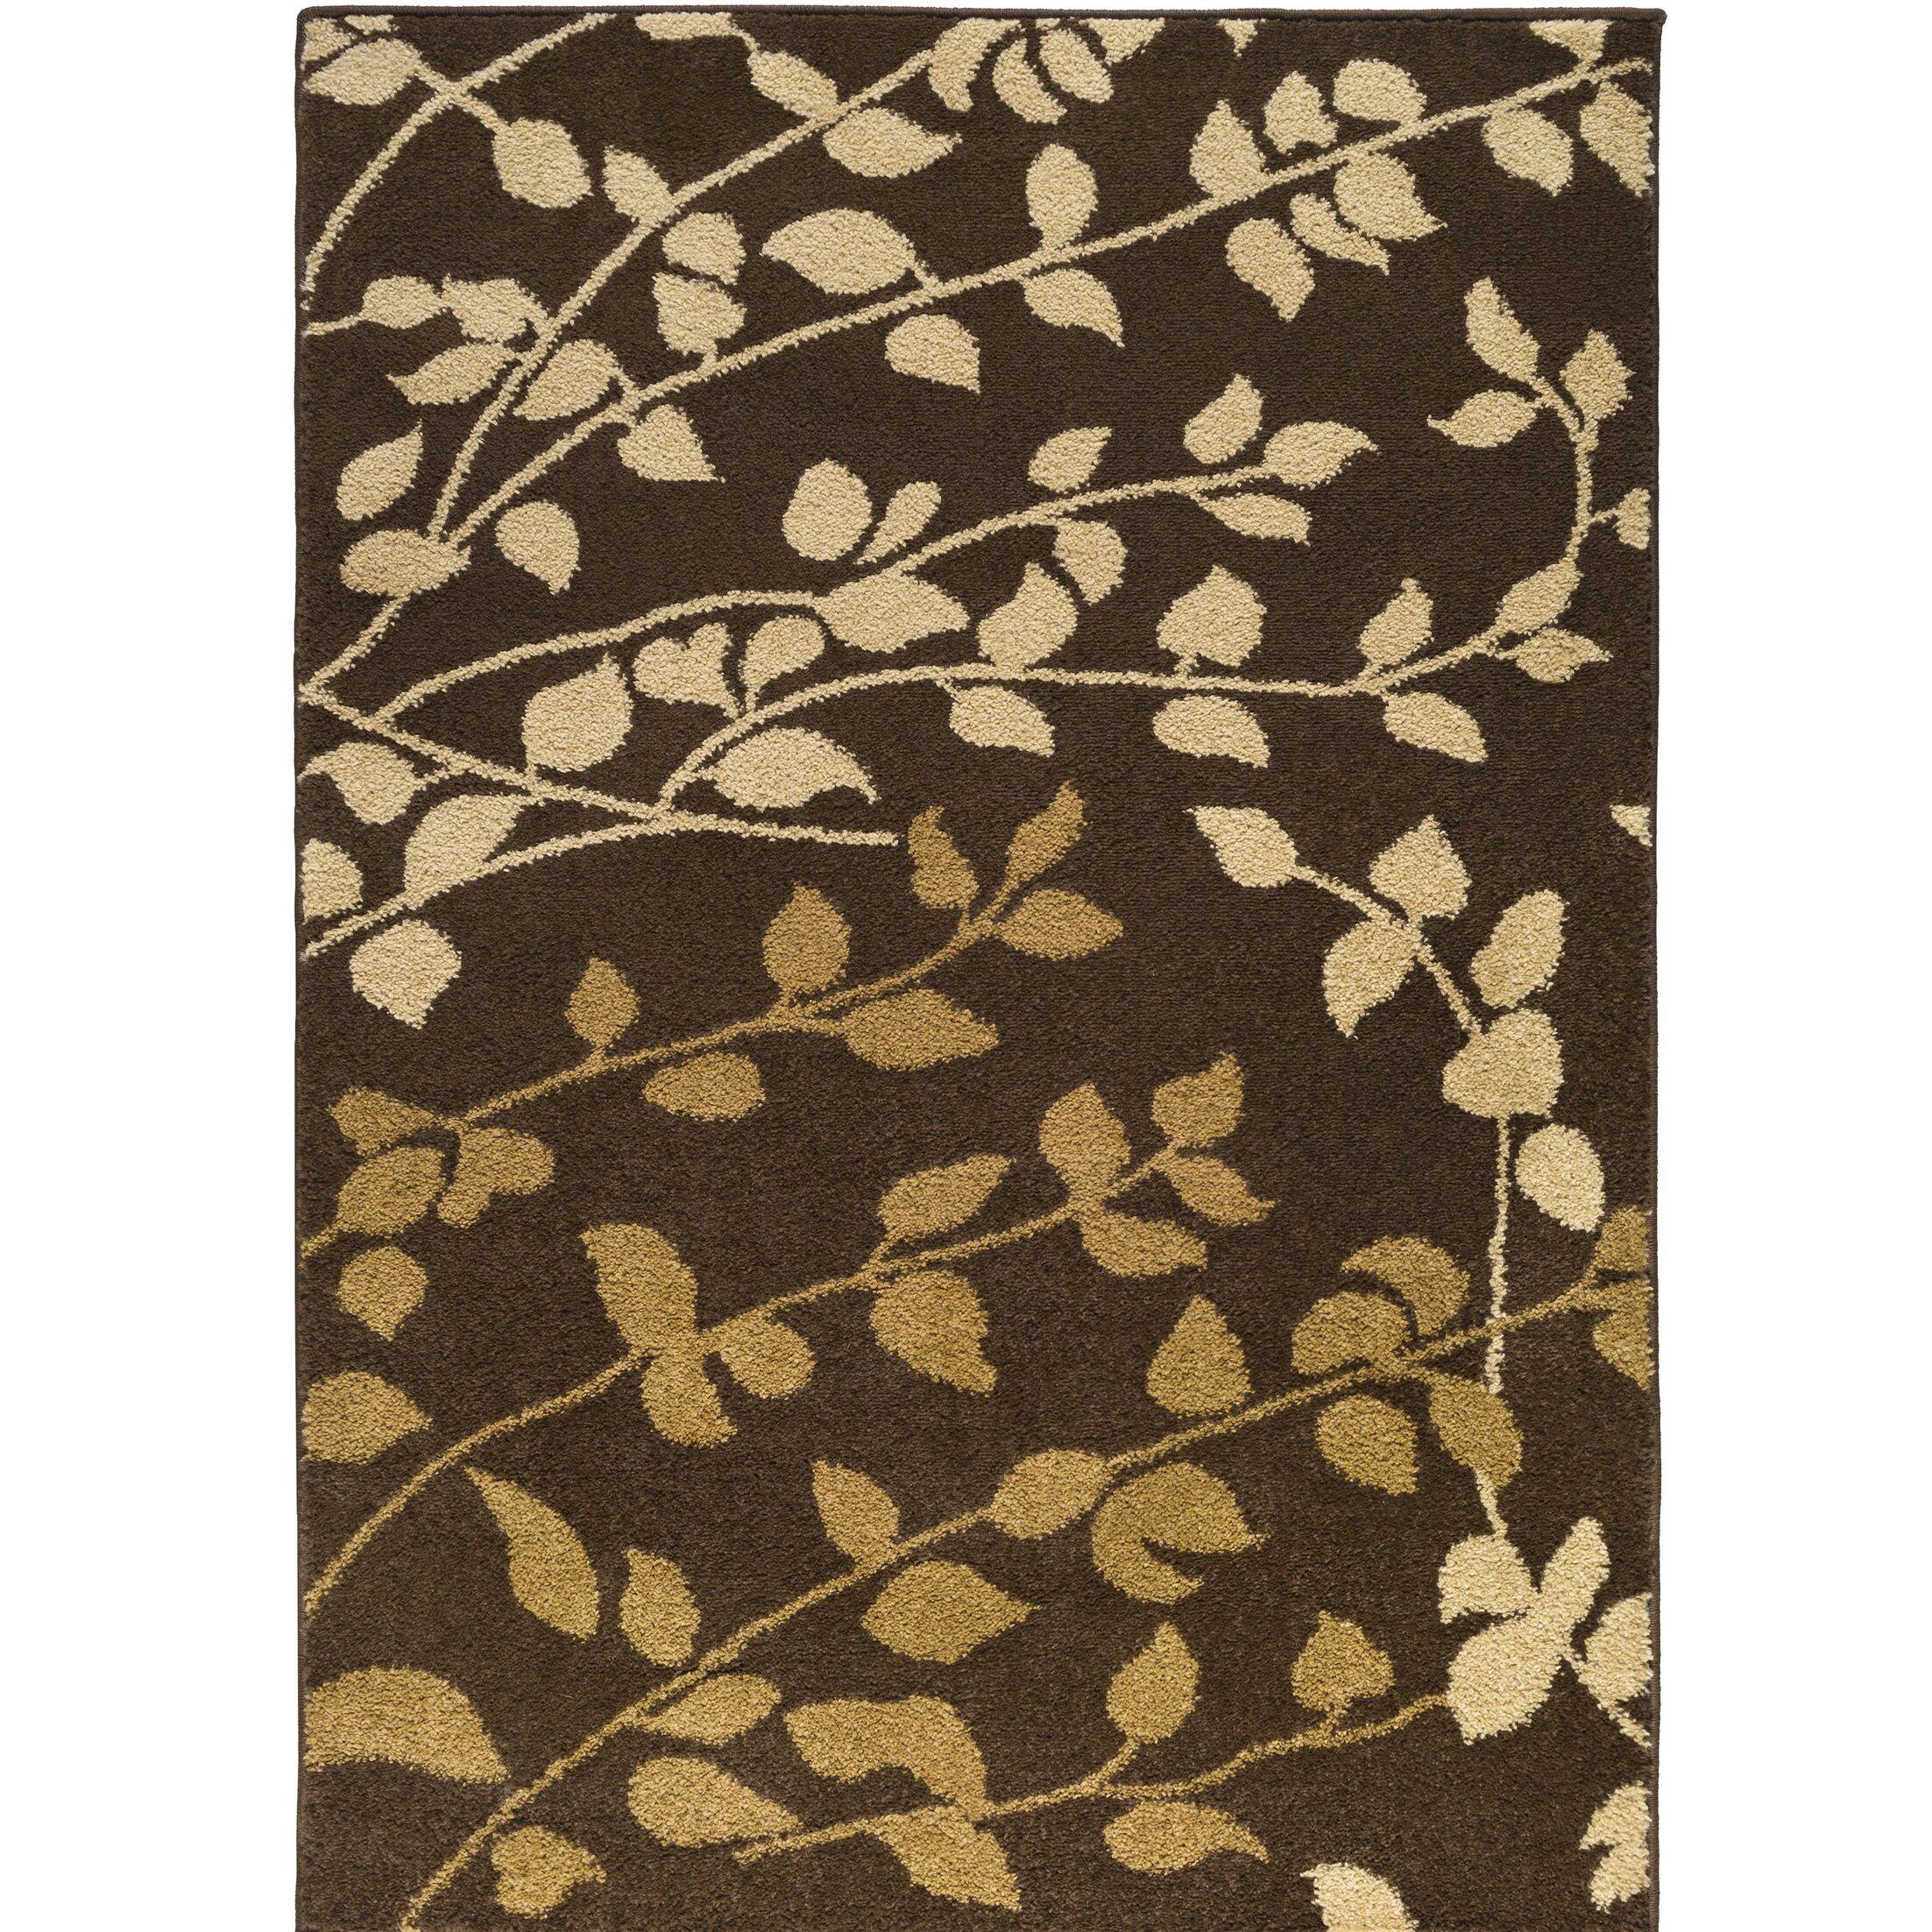 Demetria Carafe Brown/Dijon Area Rug Rug Size: Rectangle 7'6